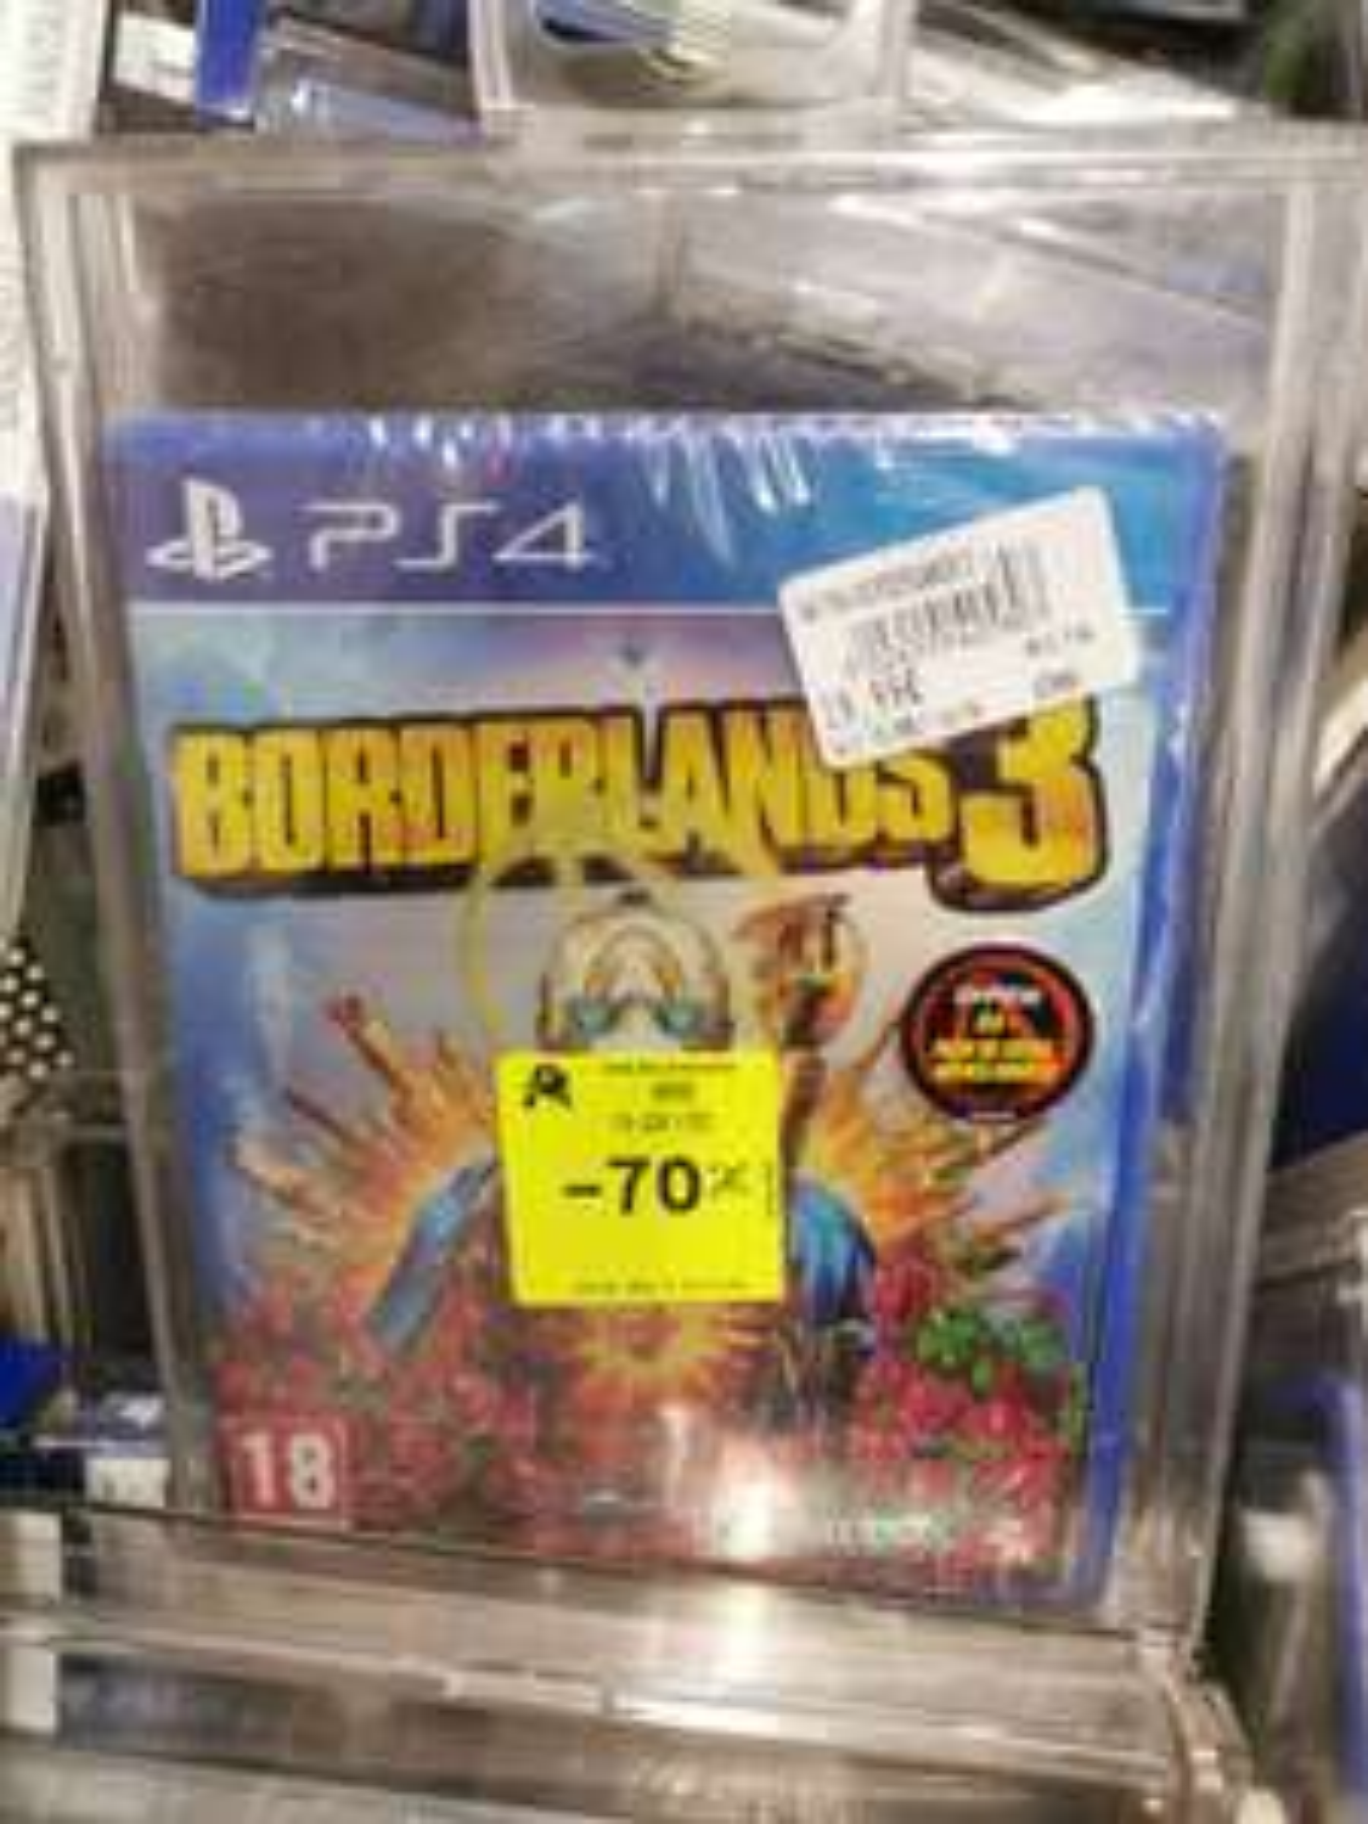 Jeu Borderlands 3 sur PS4 - Grasse (06)